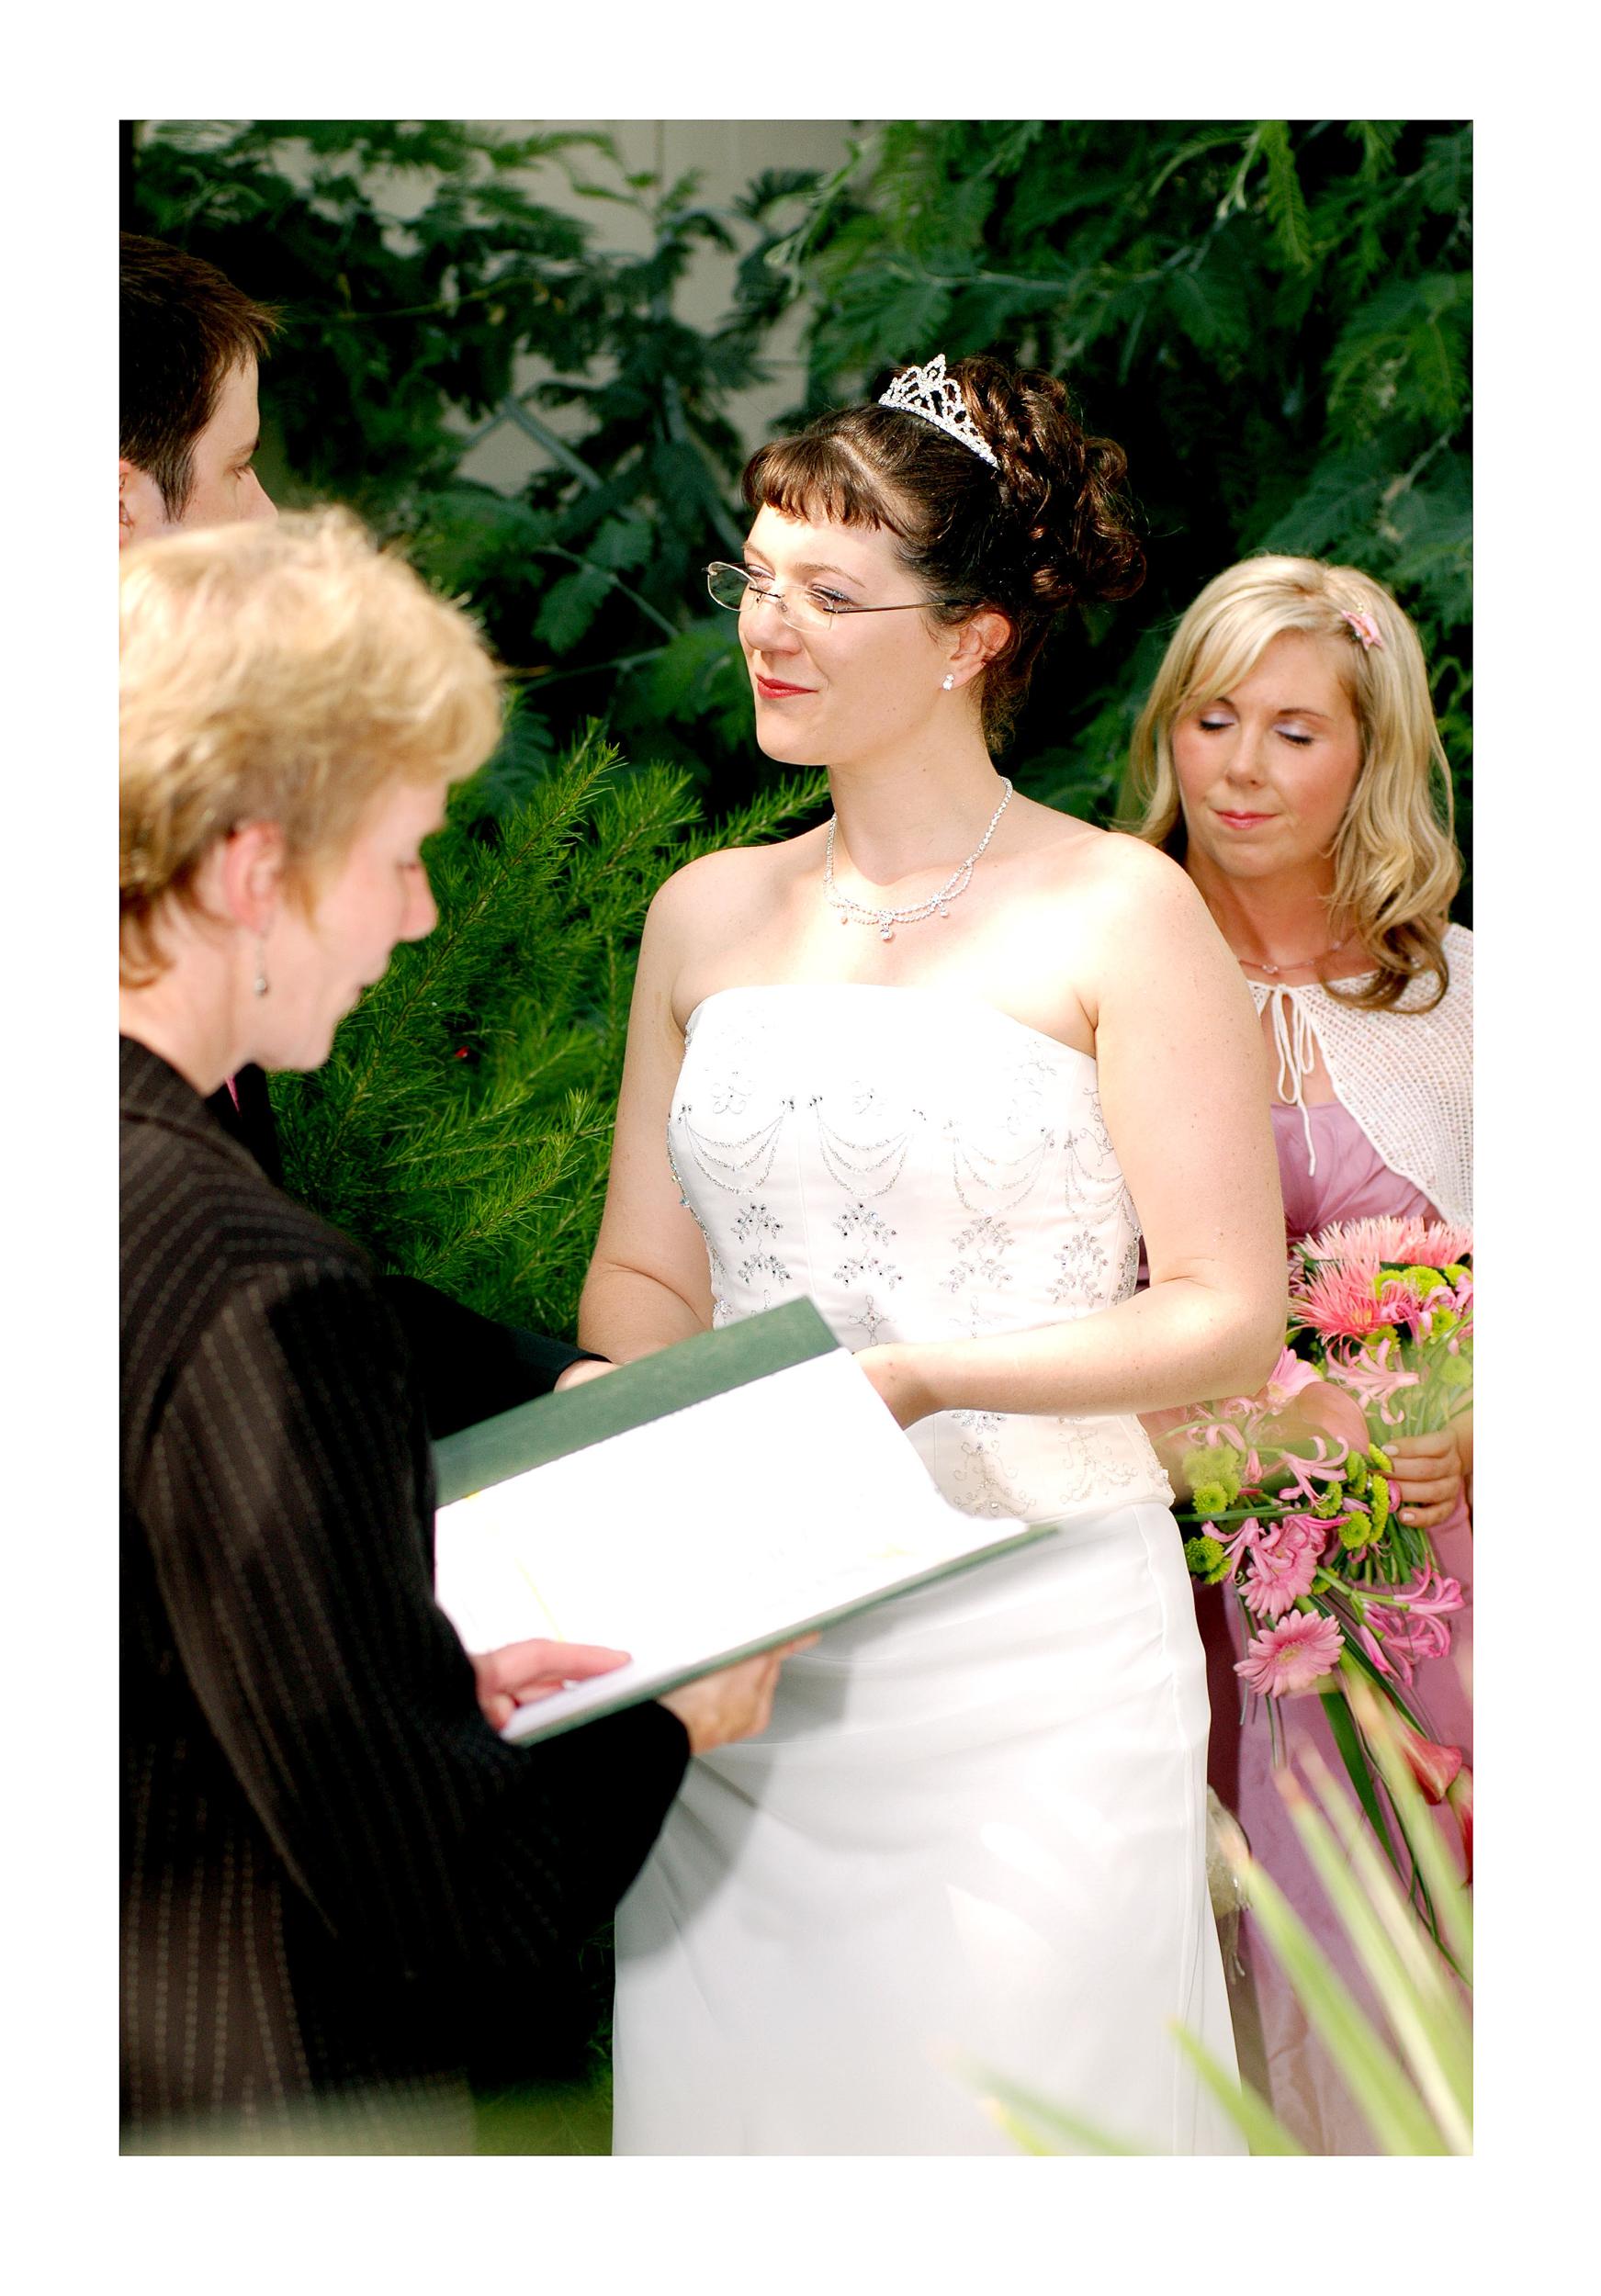 REPORTAGE-WEDDING-PHOTOGRAPHY-SET-UK-17.jpg